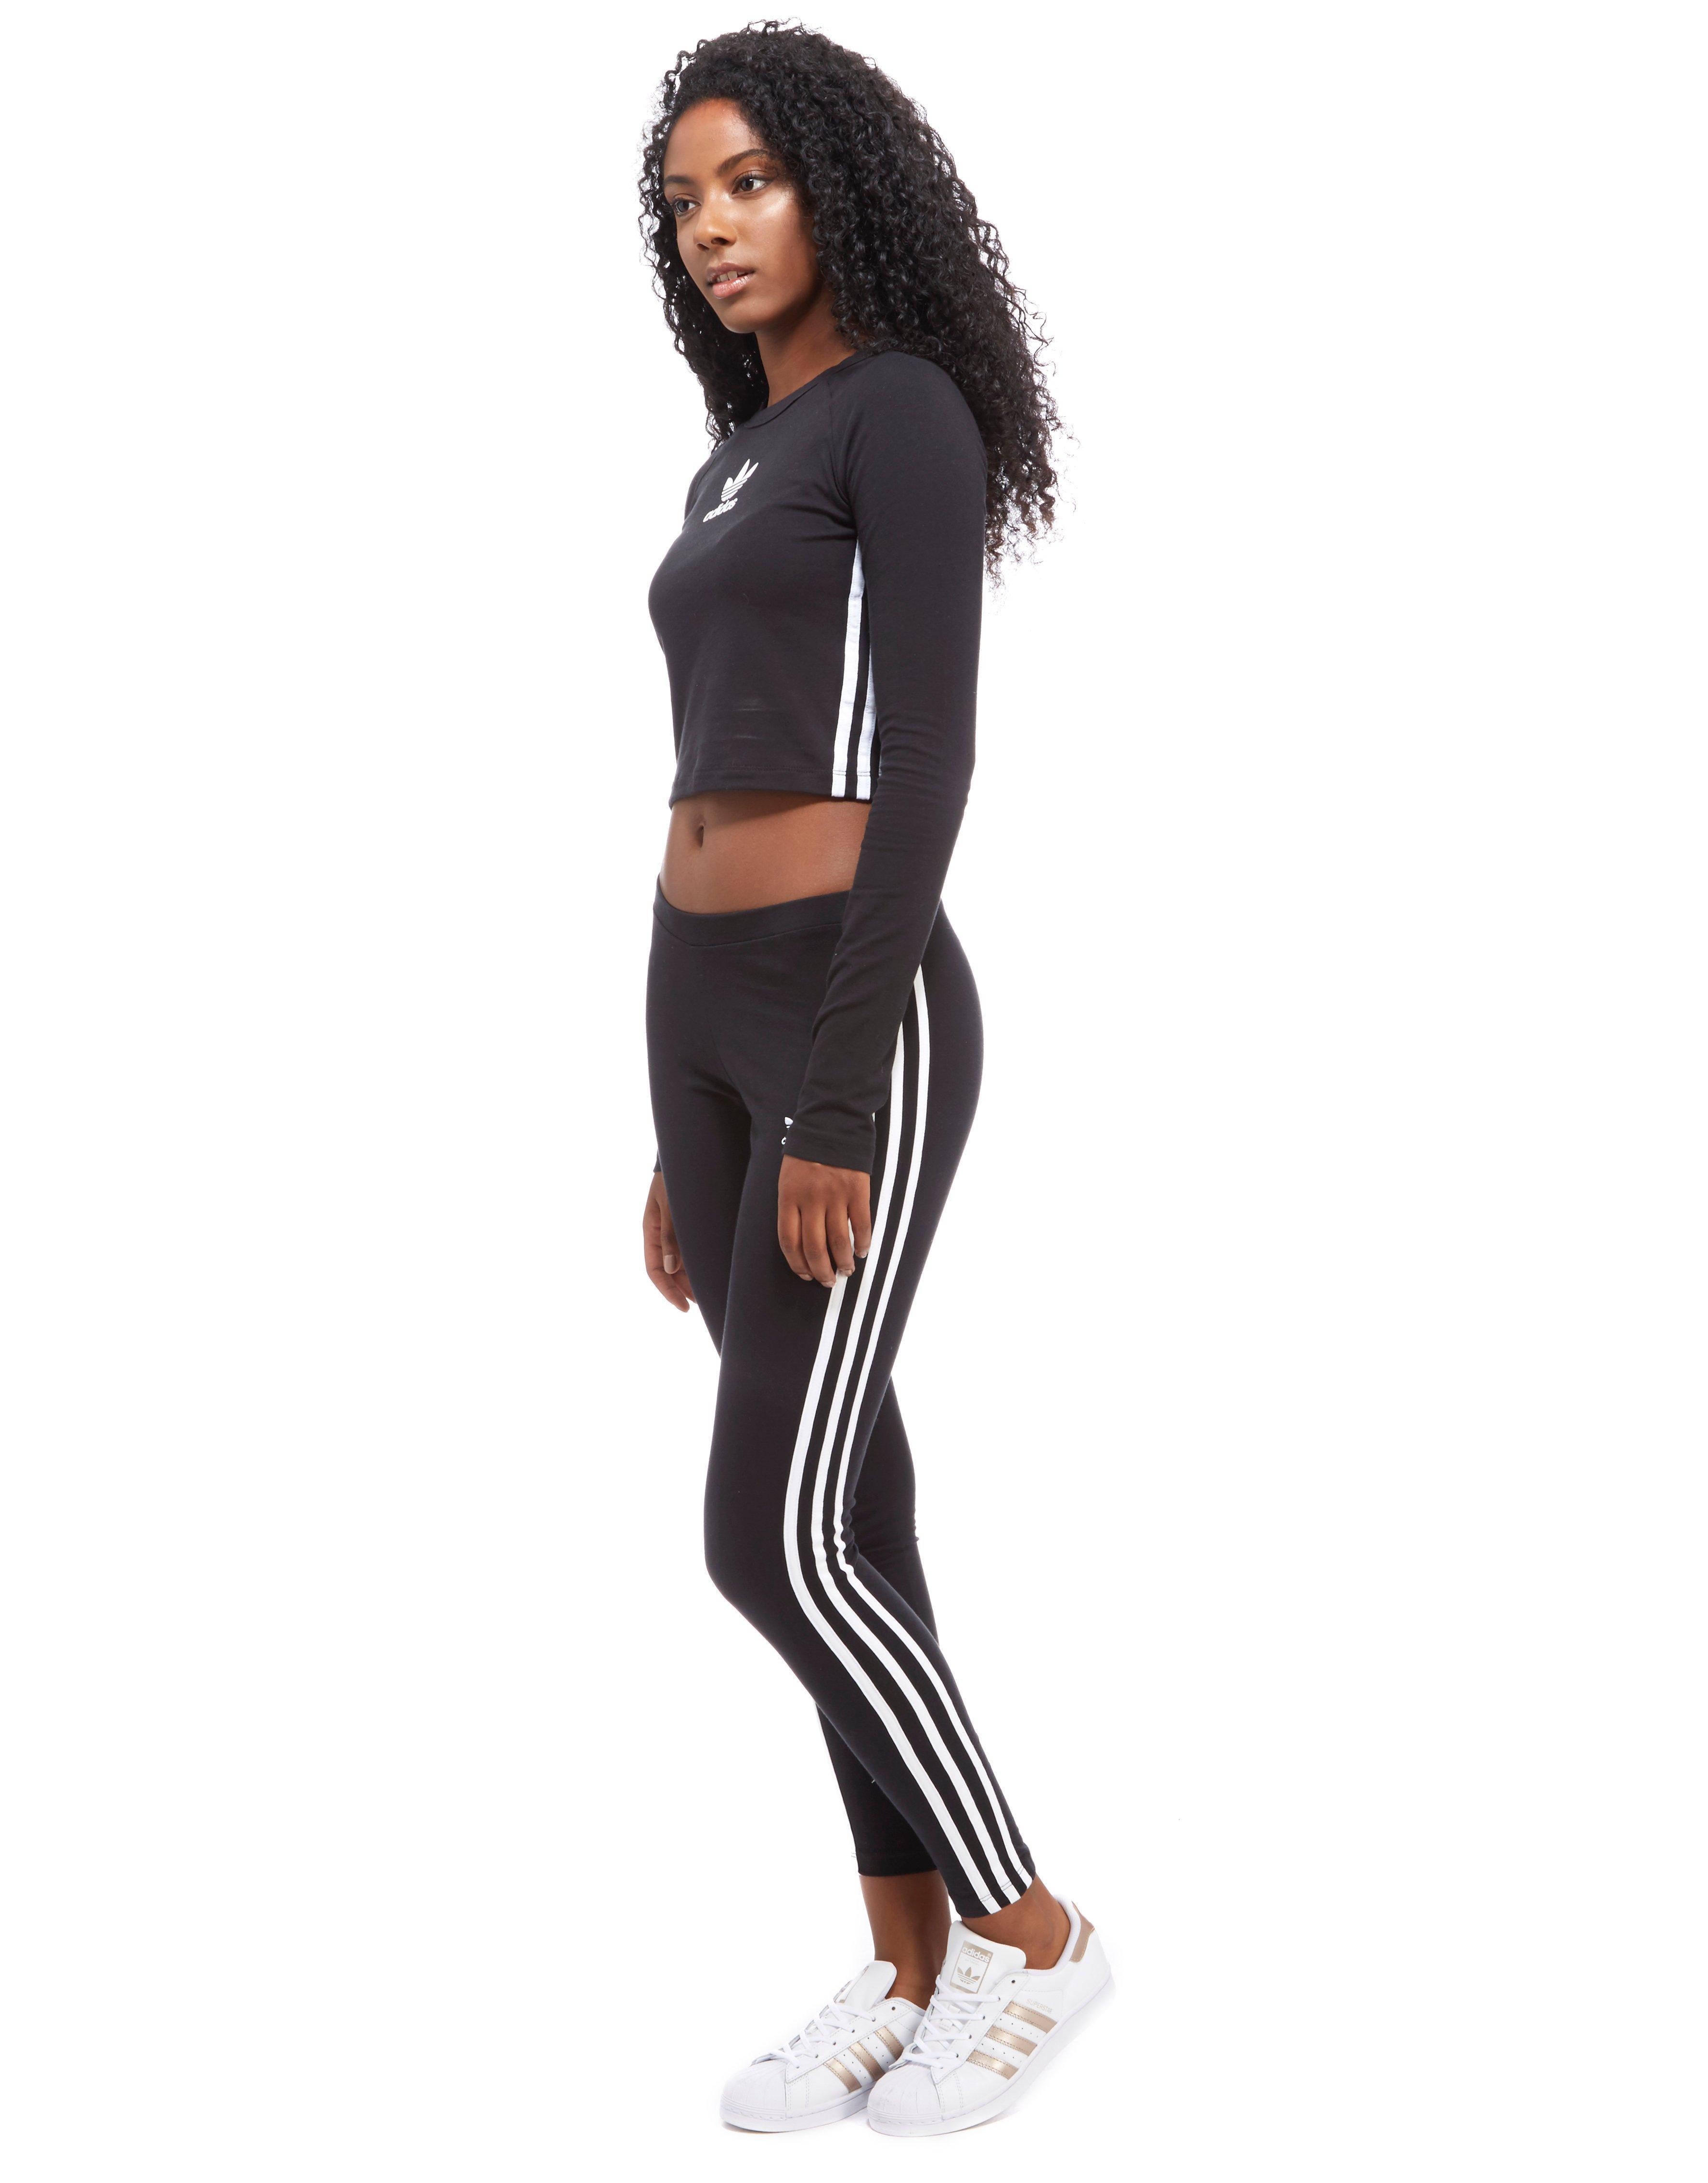 d8b2cb0ba8b adidas Originals 3-stripes Long Sleeve Crop Top in Black - Lyst